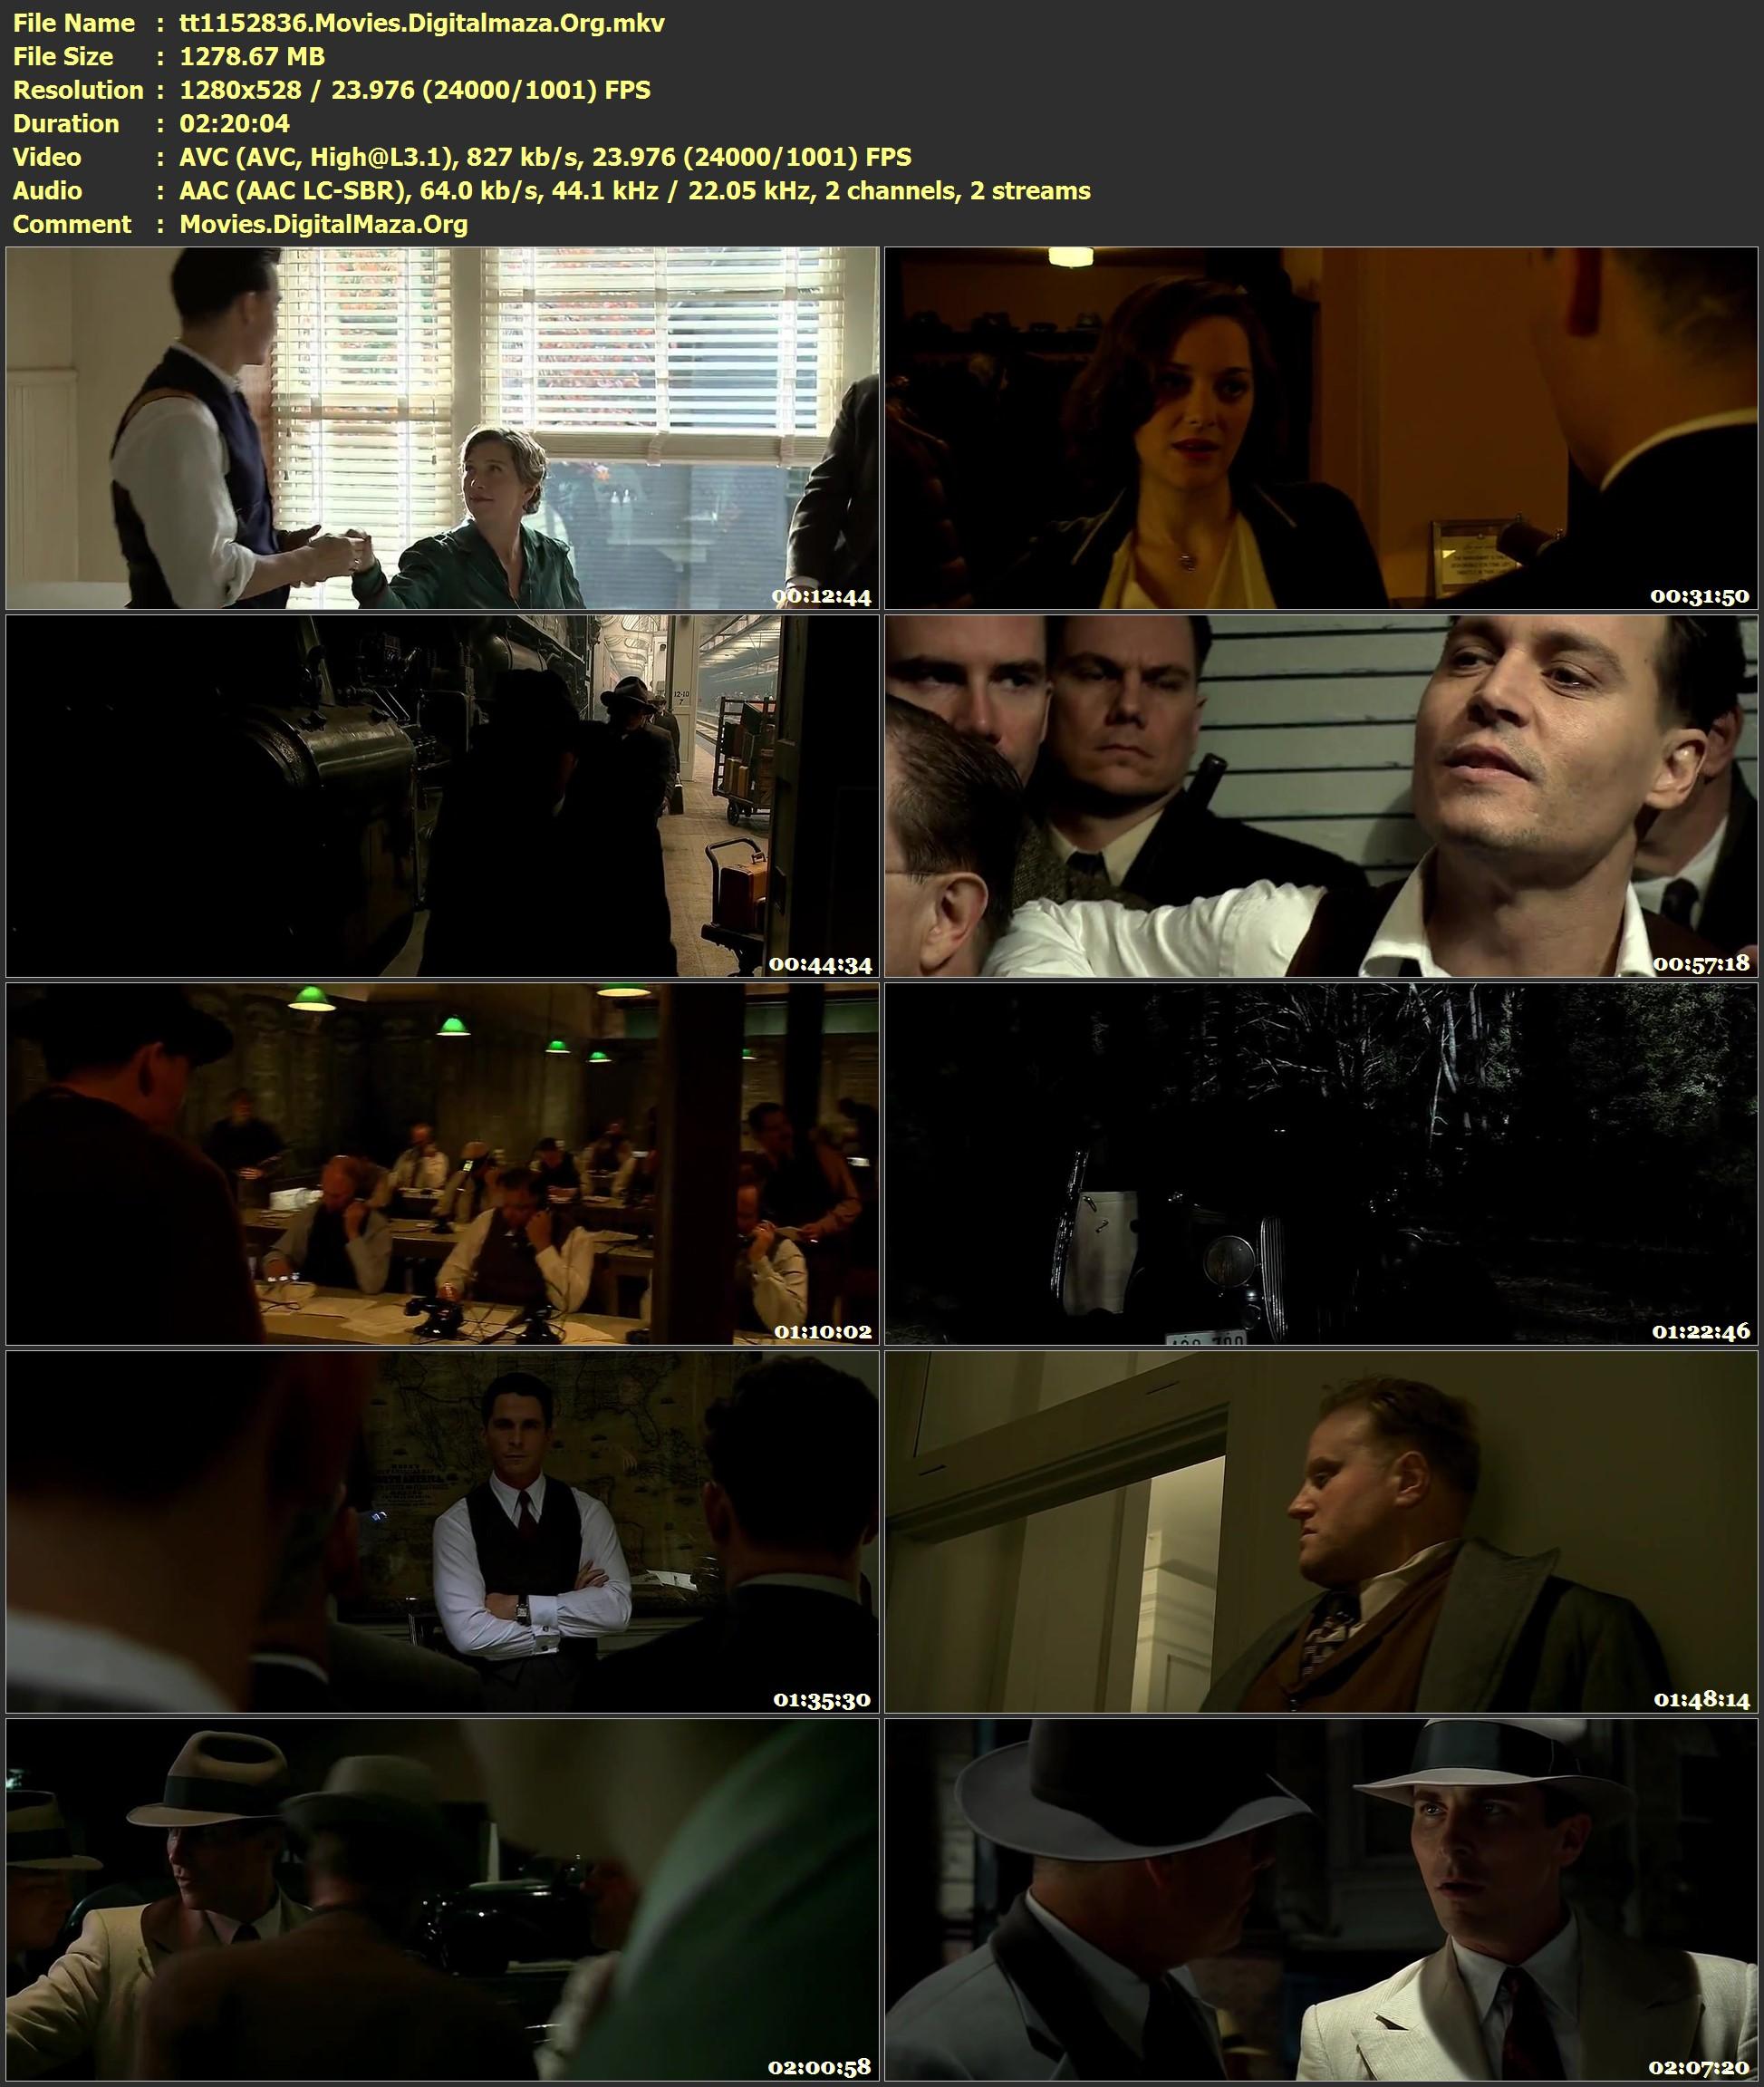 https://image.ibb.co/cOHdAS/tt1152836_Movies_Digitalmaza_Org_mkv.jpg